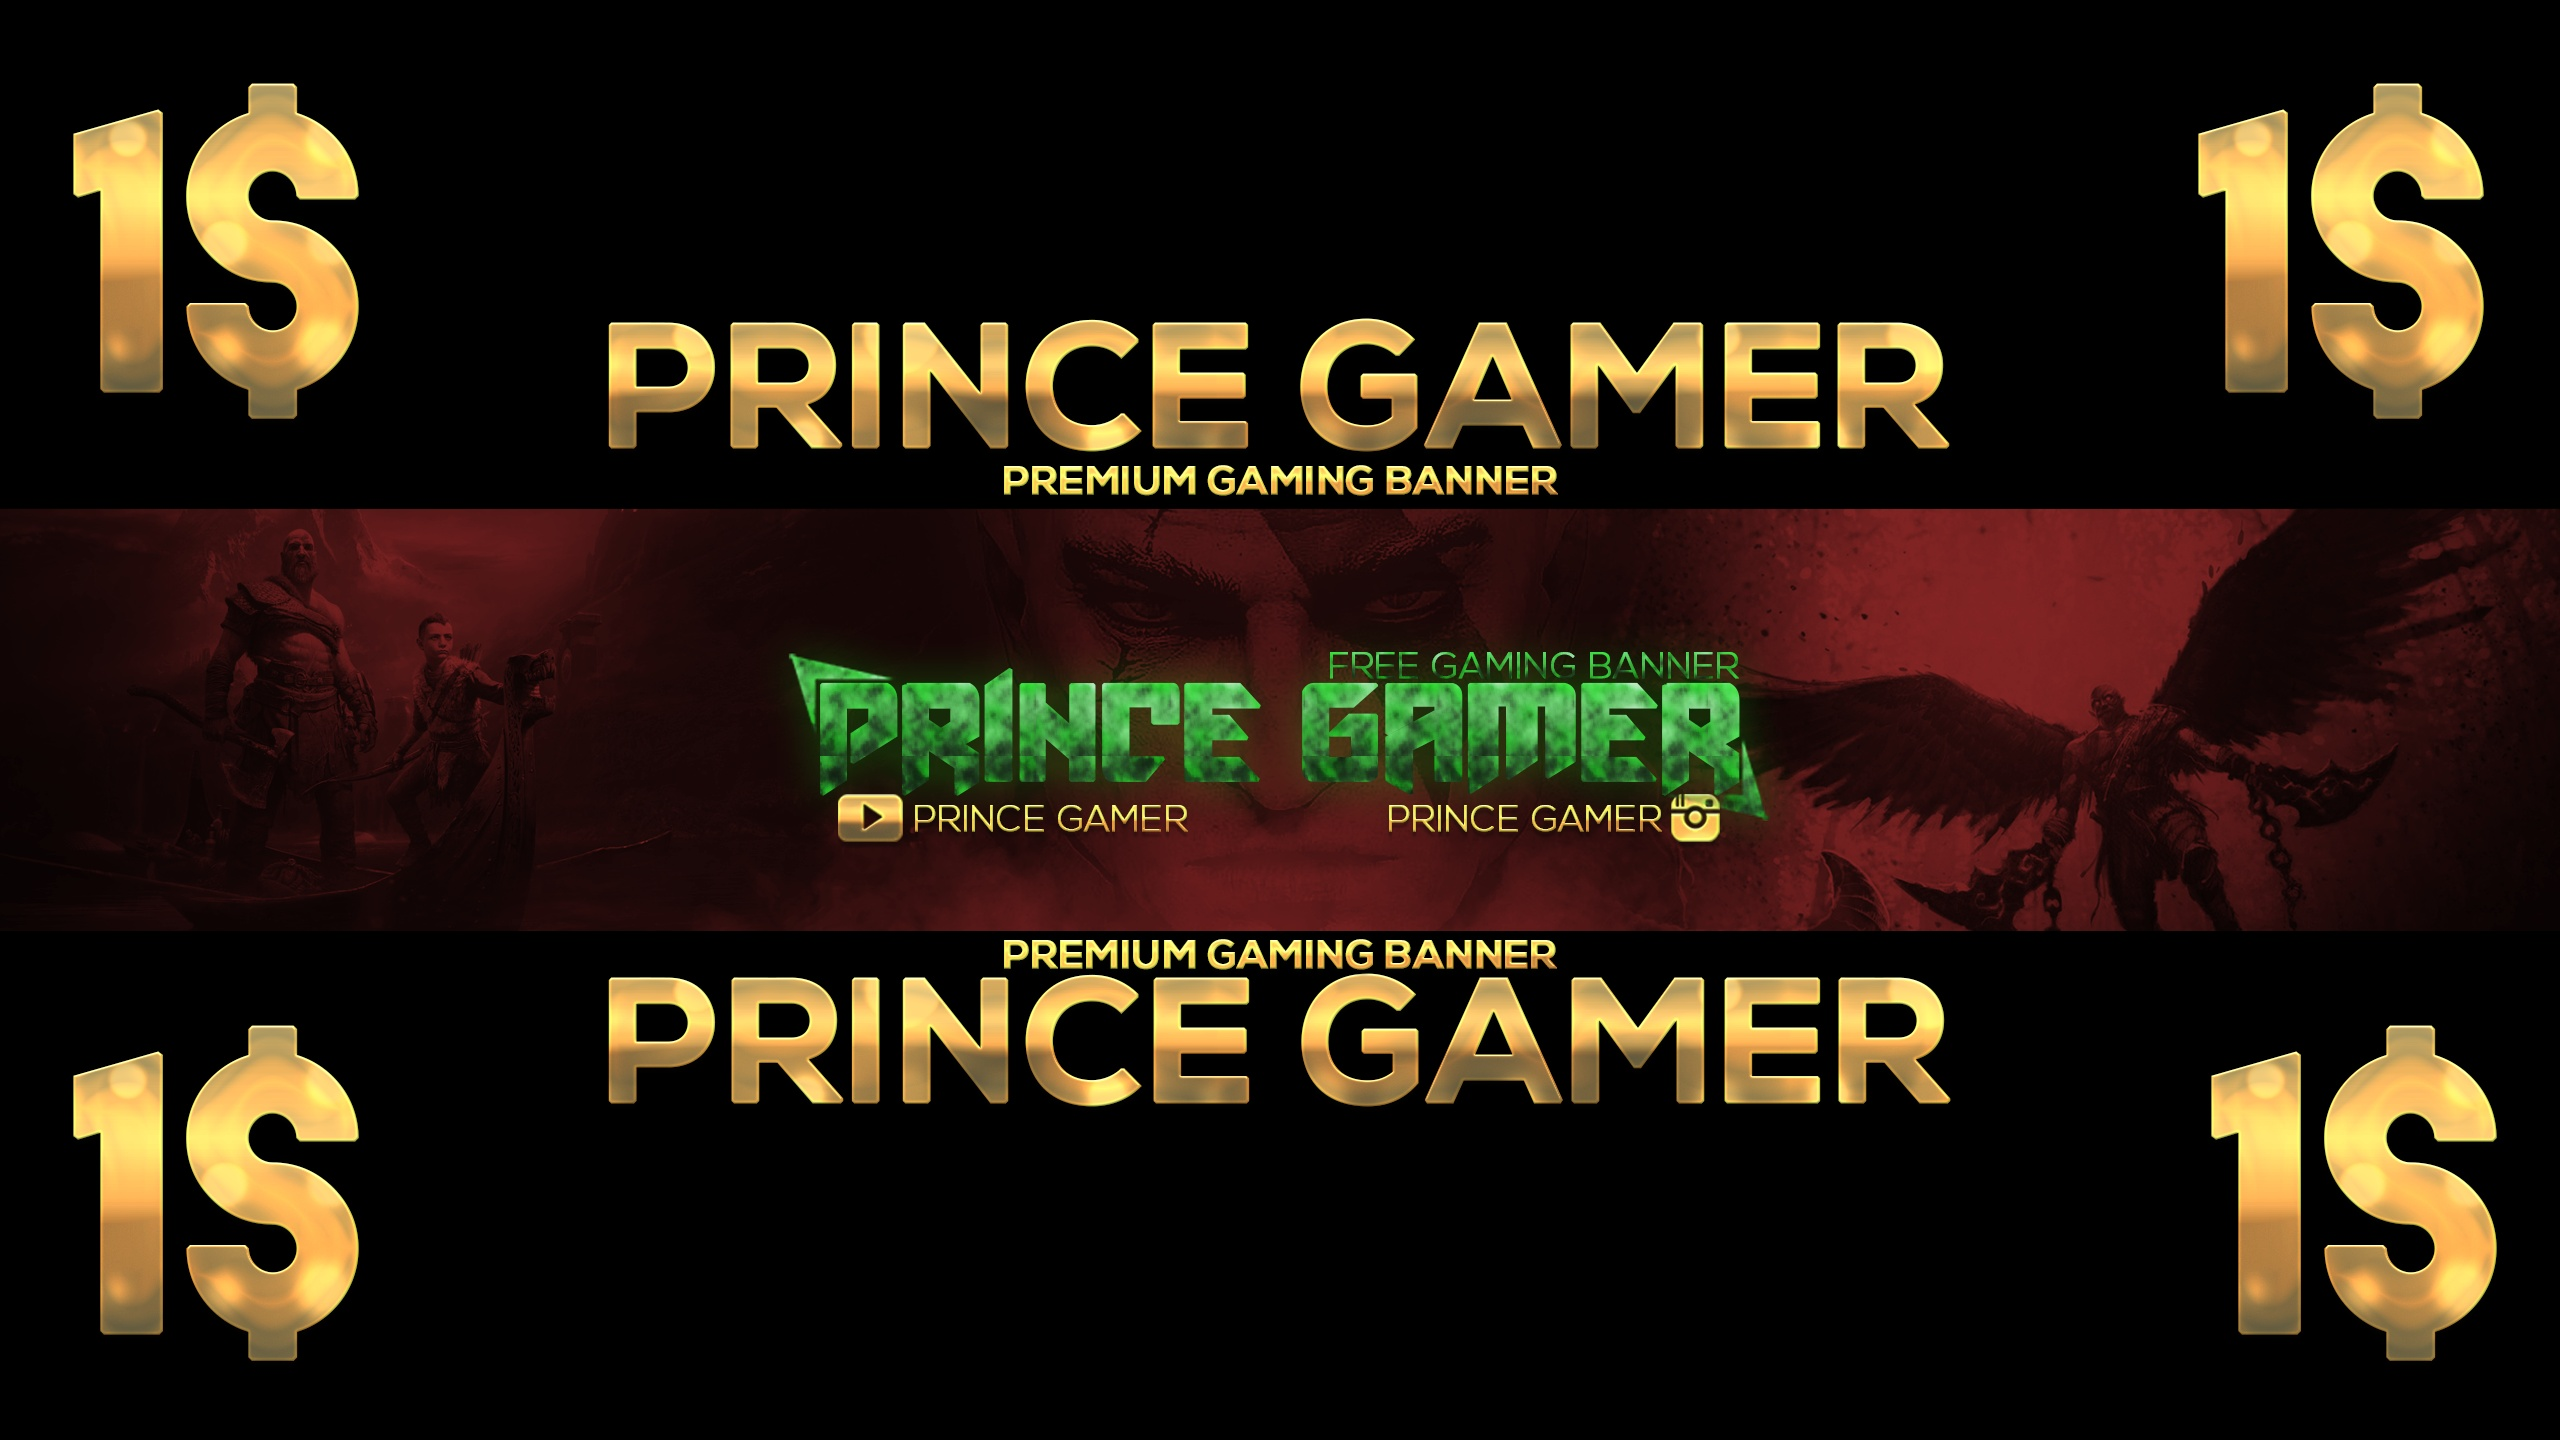 Prince Gamer Premium Gaming Banner PSD GOD Of WARS 1$